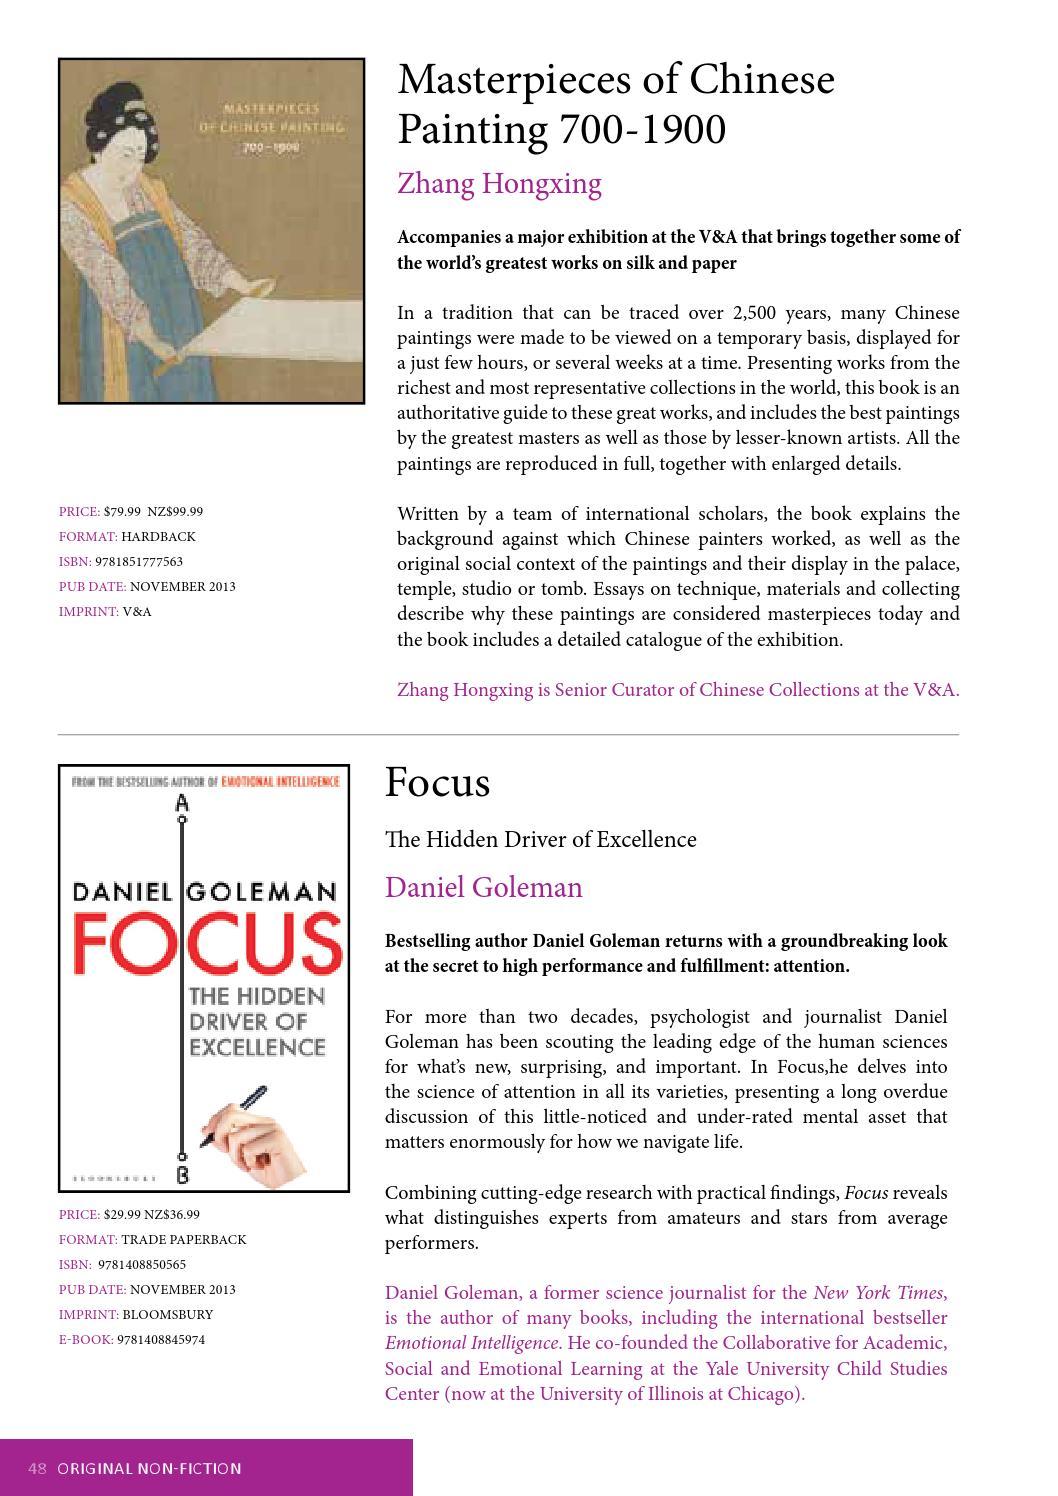 Surprising New Findings On Academic >> Bloomsbury New Titles July December 2013 By Bloomsbury Pty Ltd Issuu